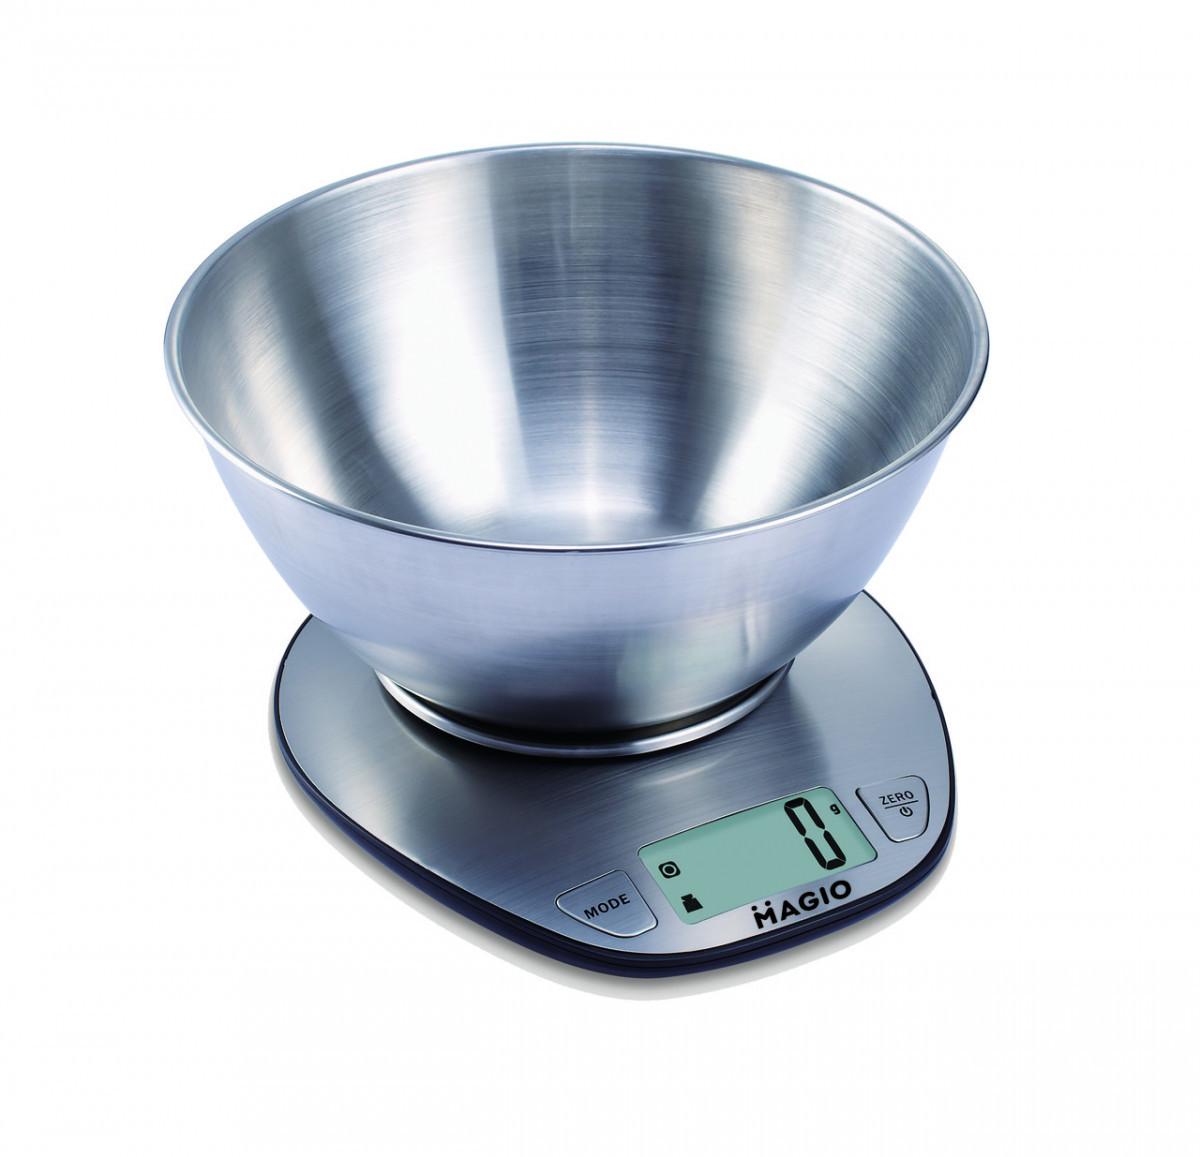 Весы кухонные MAGIO MG-691 5 кг/электр./нерж/ж/к дисп